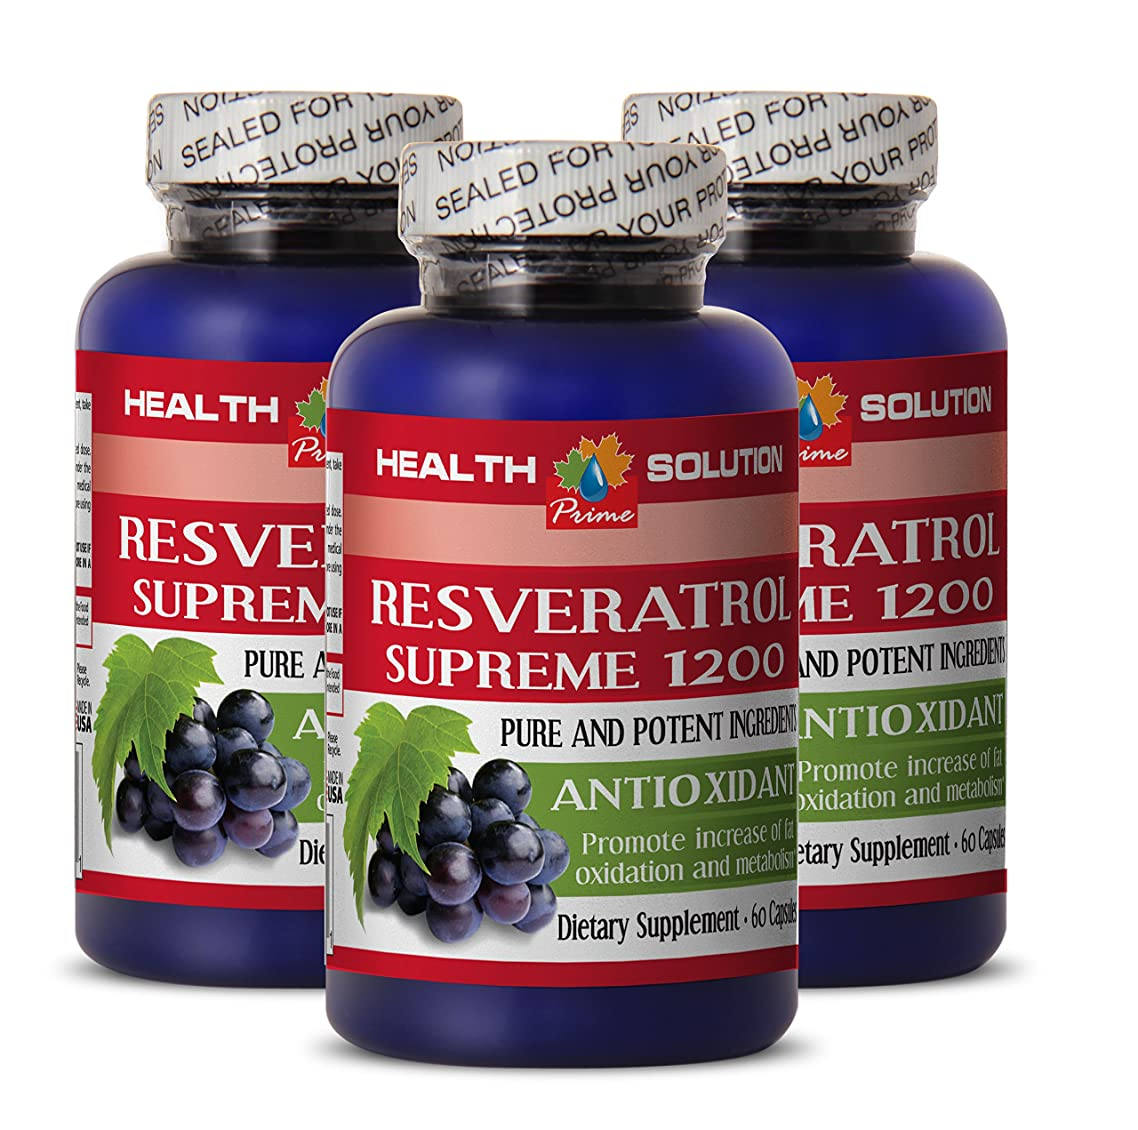 Resveratrol capsules - RESVERATROL SUPREME 1200MG - weight loss results (3 Bottles)